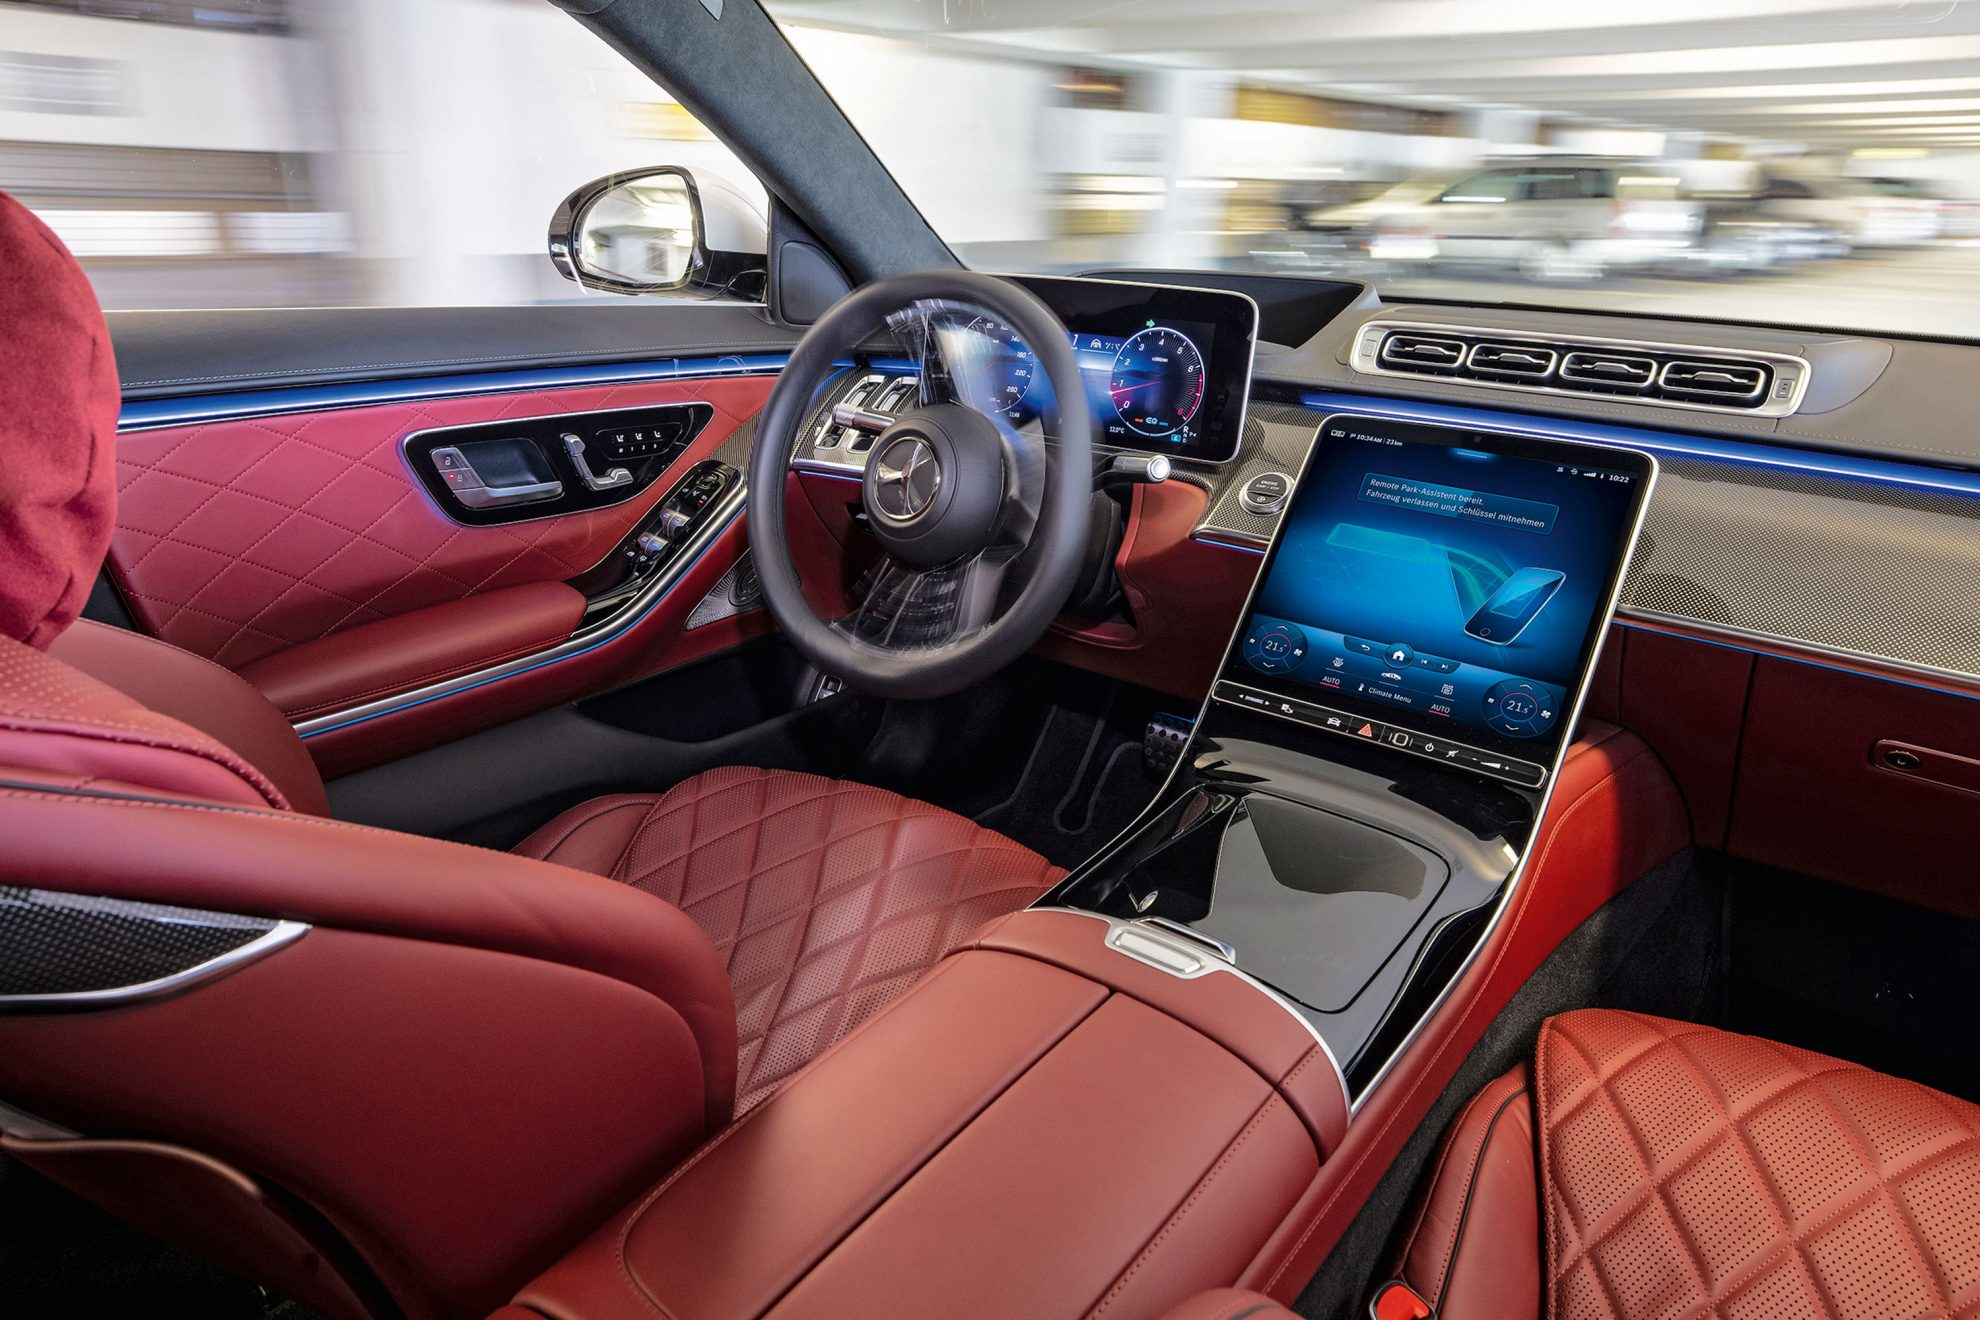 Mercedes-Benz S 500 4MATIC (Krafstoffverbrauch kombiniert (NEFZ): 8,4,7-7,8 l/100 km, CO2-Emissionen kombiniert (NEFZ): 192-179 g/km); Exterieur: designo diamantweiss bright, AMG Line; Interieur: Leder Exklusiv karminrot/schwarz // Mercedes-Benz S 500 4MATIC (combined fuel consupmtion (NEDC): 8.4-7.8 l/100 km, combined CO2-emissions (NEDC): 192-179 g/km); exterior: designo diamond white bright, AMG line; interior: leather exclusive carmine red/black